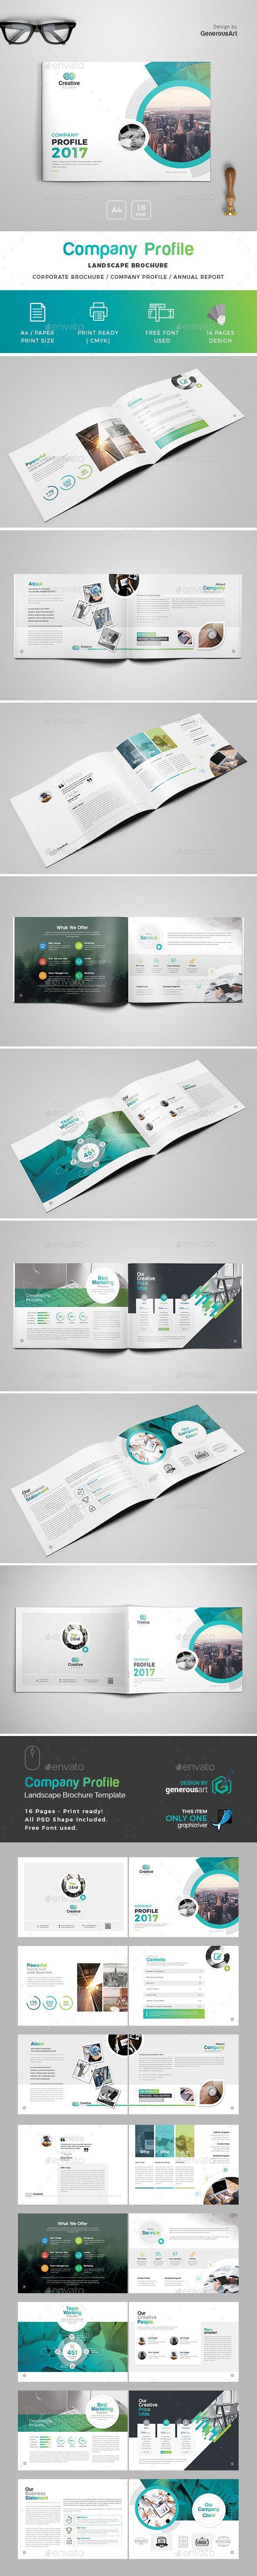 Company Profile Landscape Brochure Template Company Profile - Horizontal brochure template